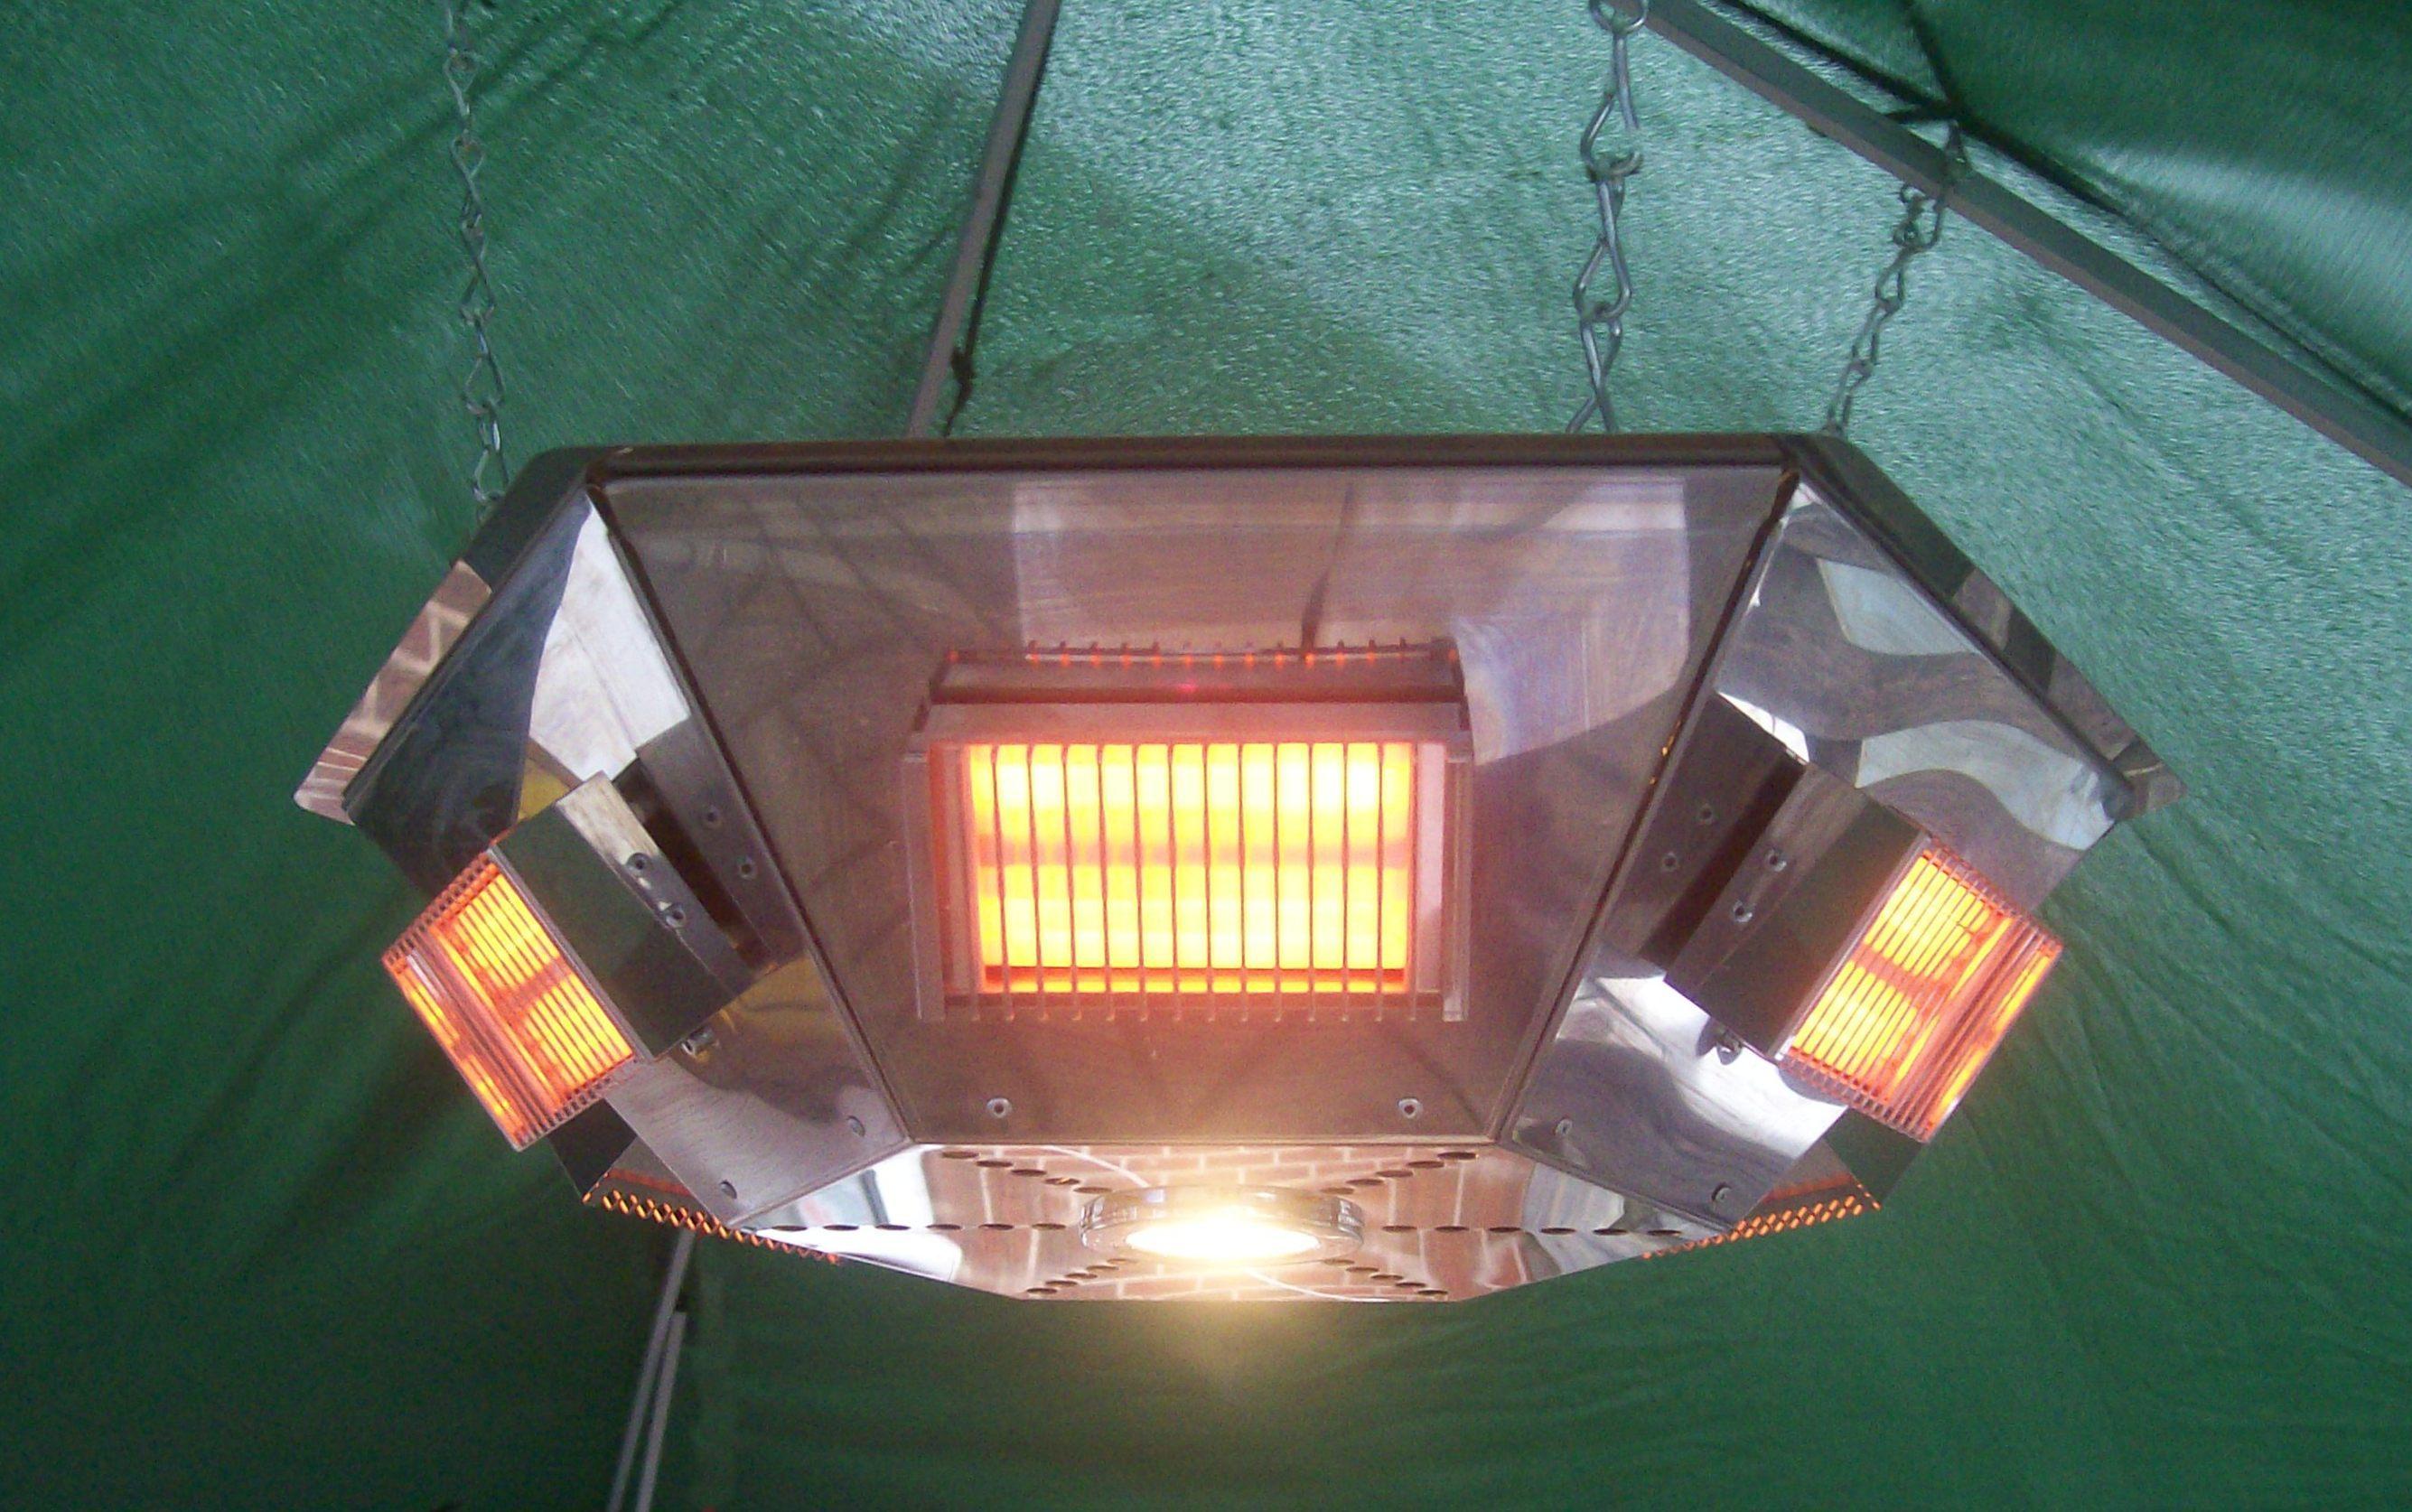 Pendant Gazebo Heater 3kw And 6kw Heat Outdoors